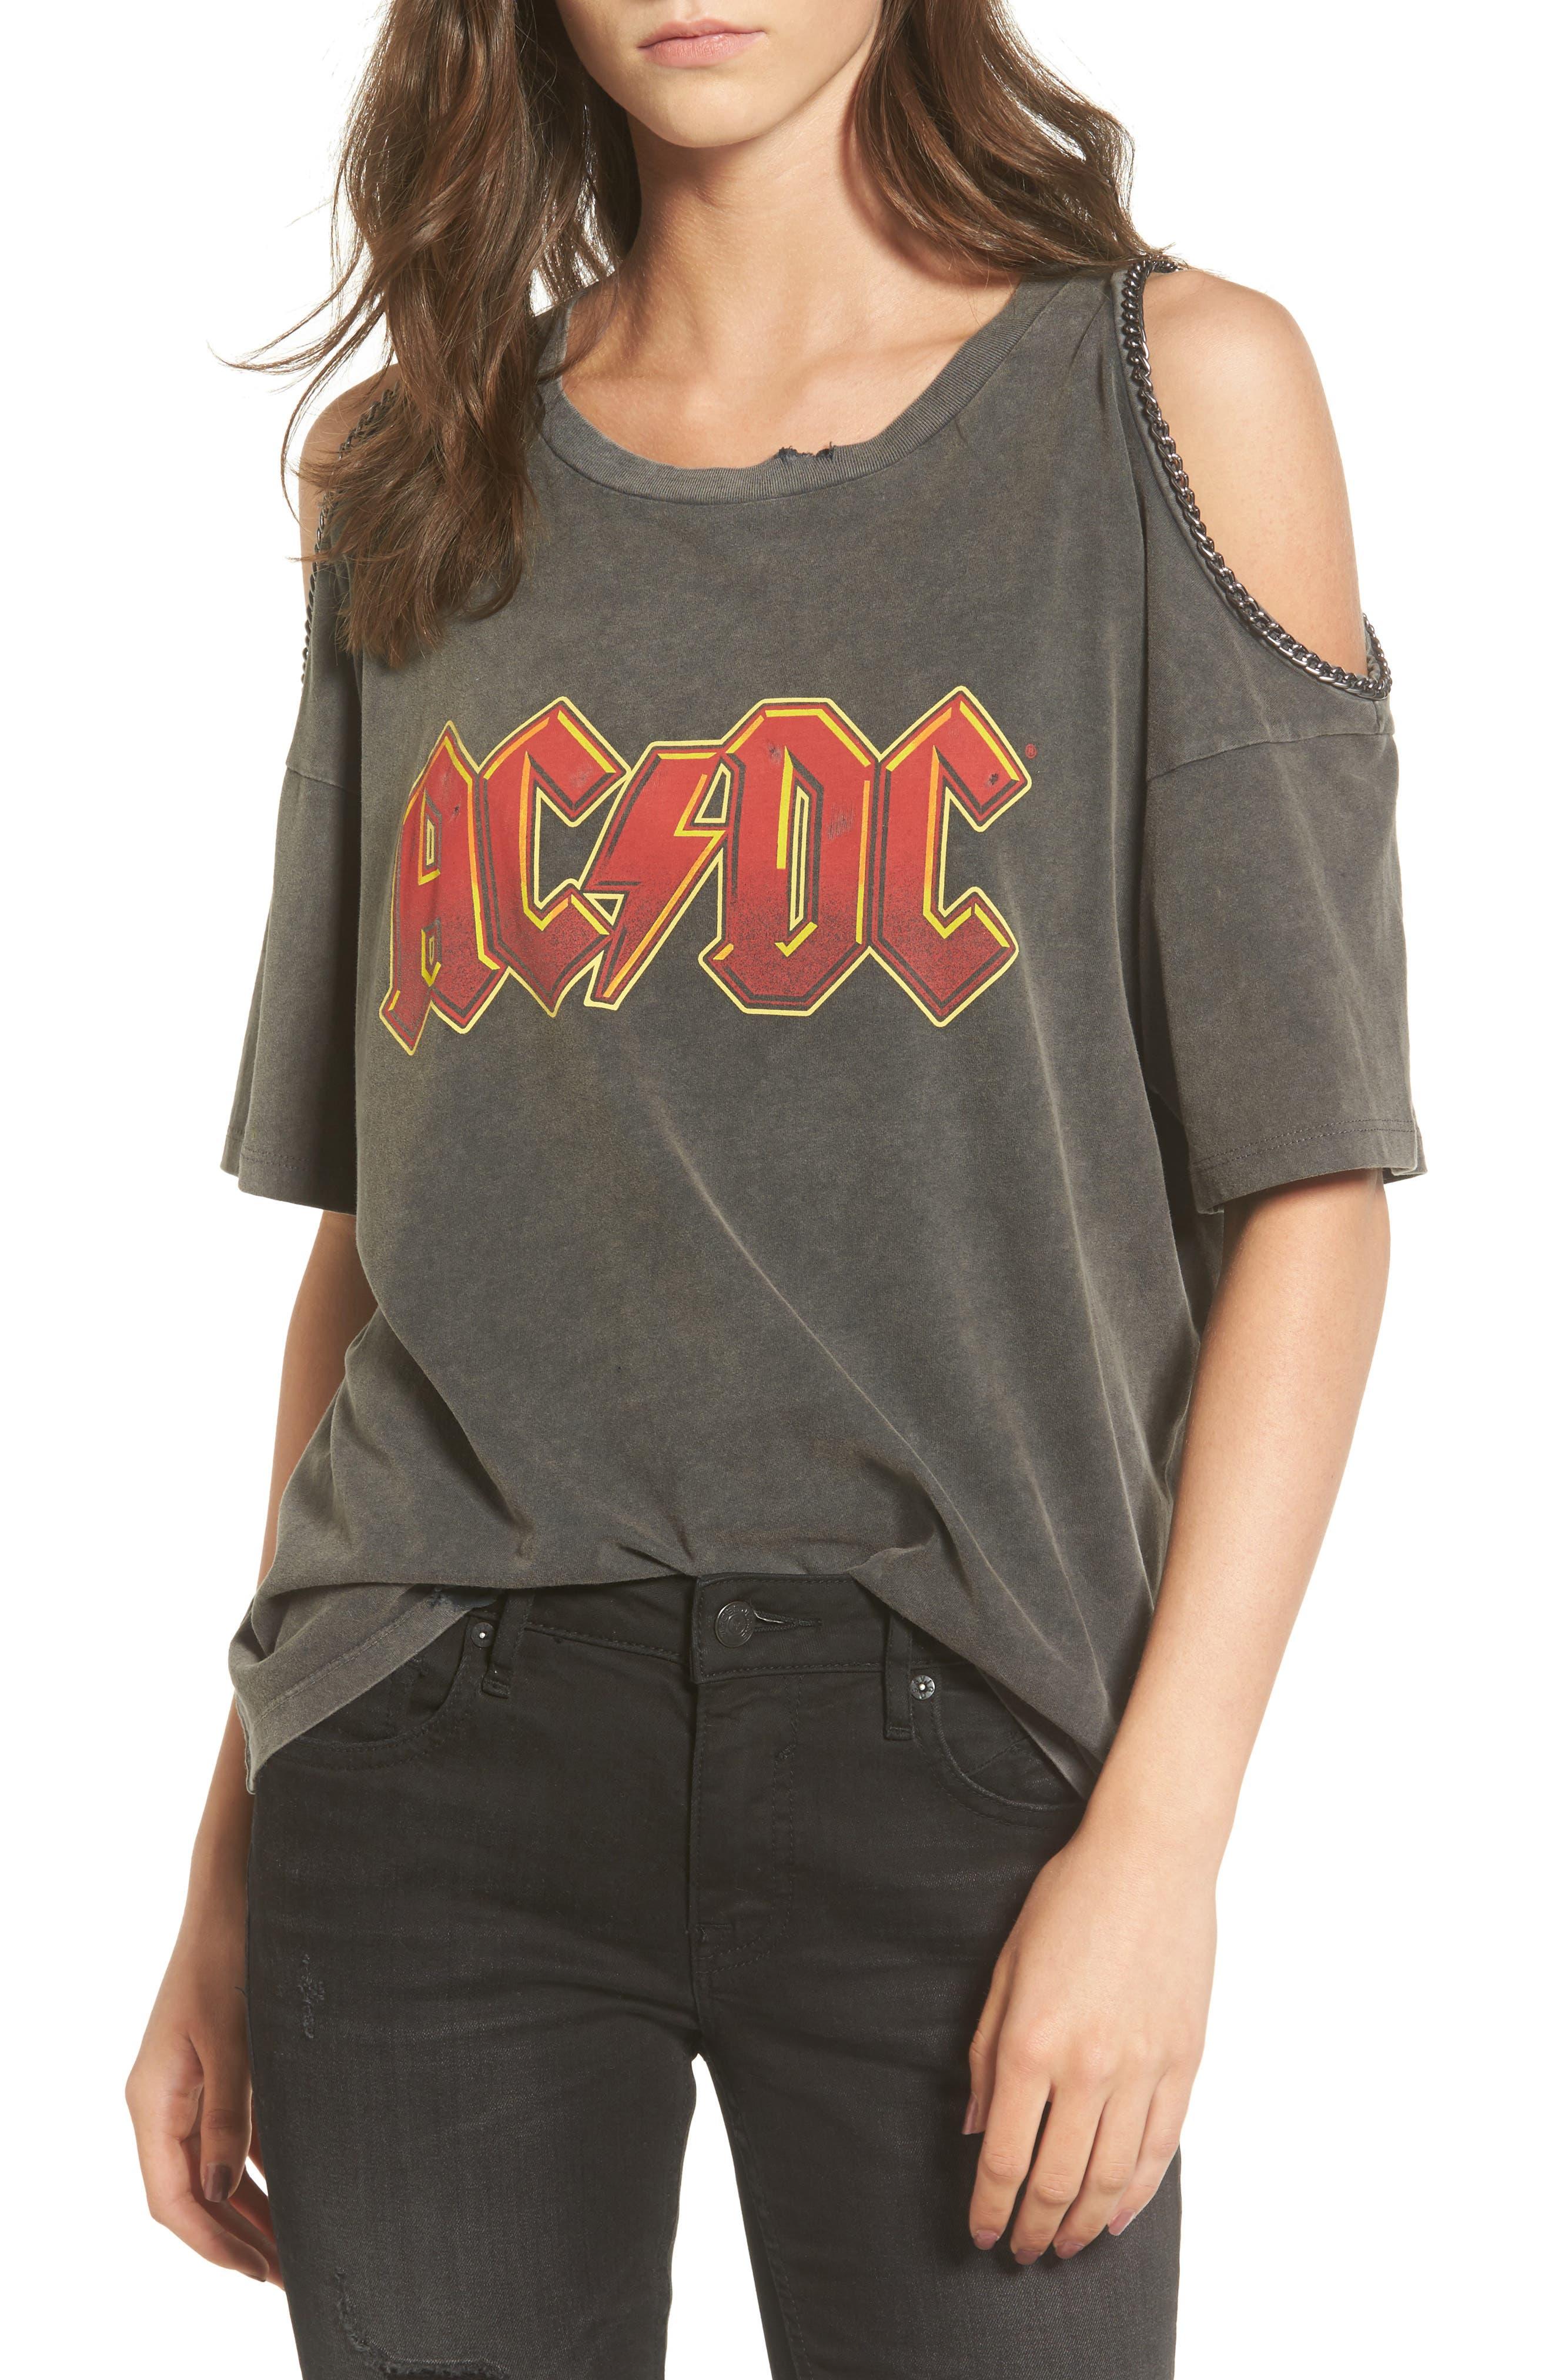 Topshop AC/DC Graphic Cold Shoulder Tee